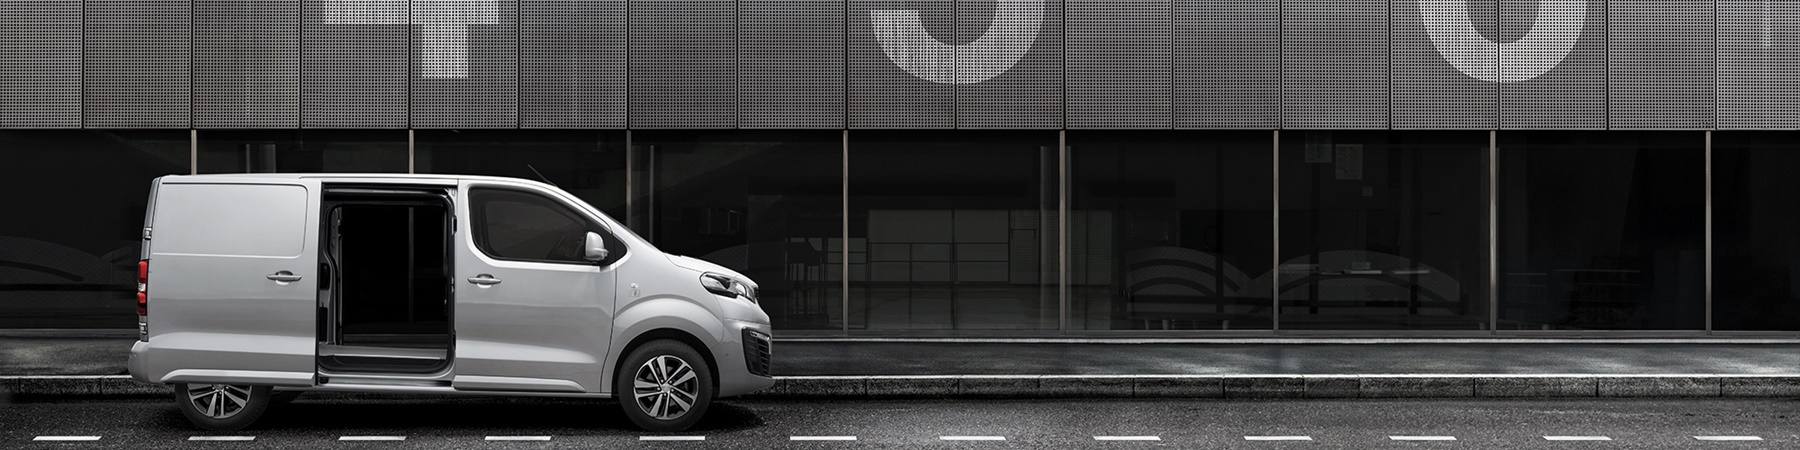 Peugeot Expert Combi  50kWh 196 km actieradius